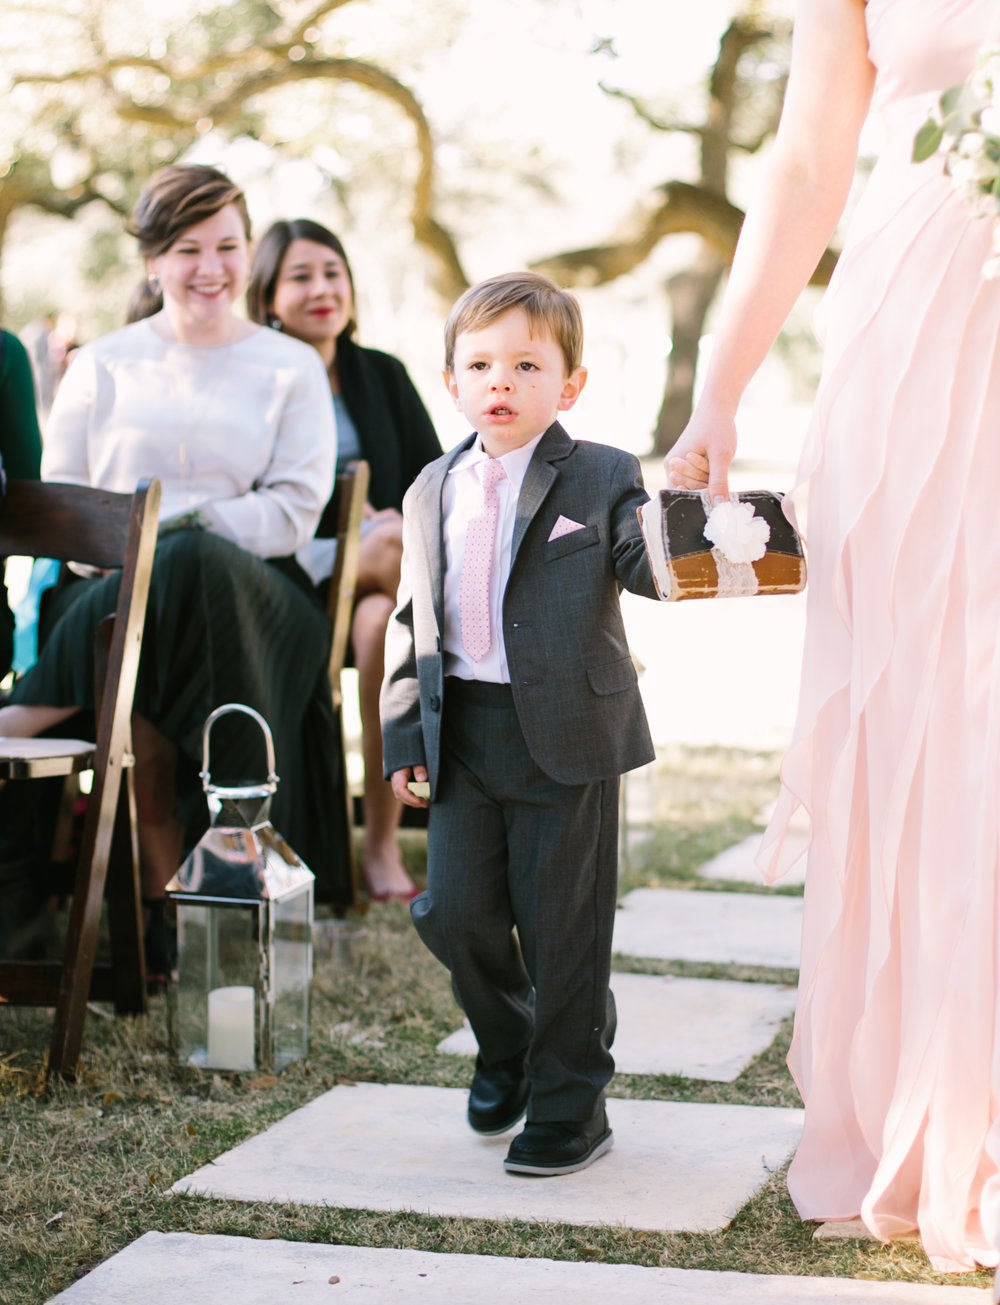 Central Texas Wedding   Vineyards at Chappel Lodge   Fine Art   Emilie Anne Photography-5.jpg